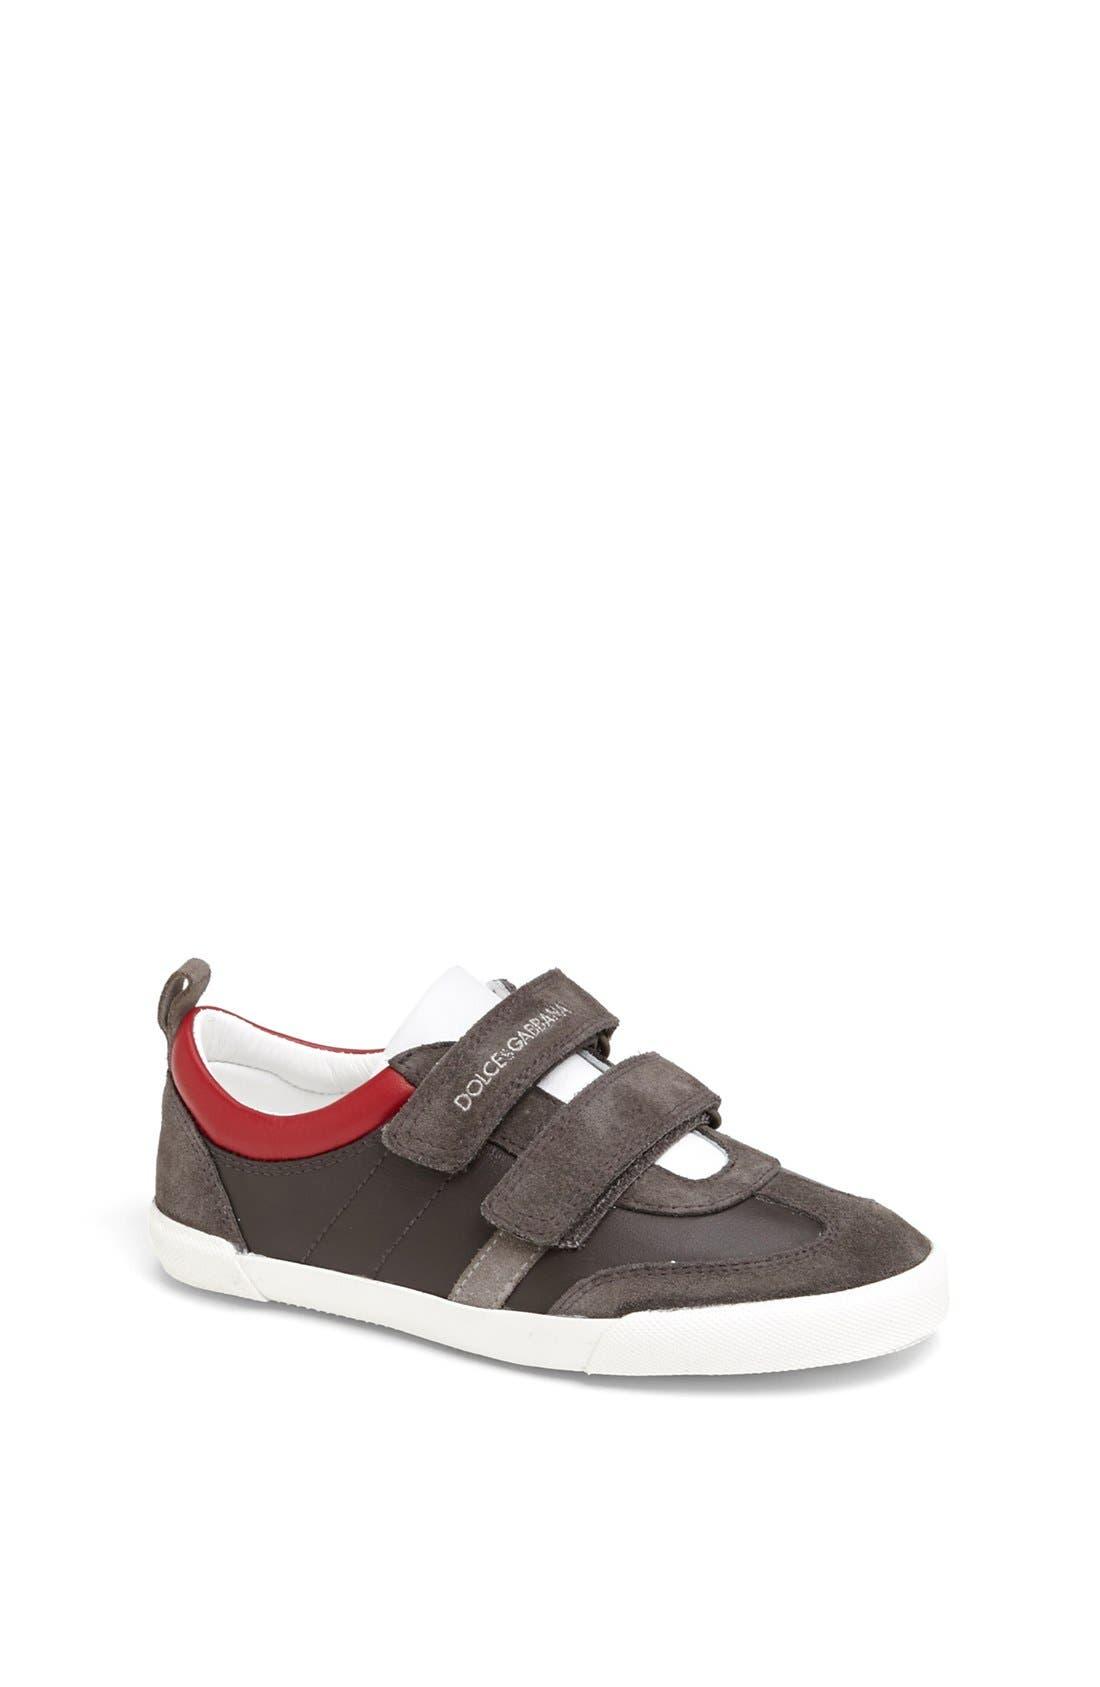 Alternate Image 1 Selected - Dolce&Gabbana Sneaker (Toddler, Little Kid & Big Kid)